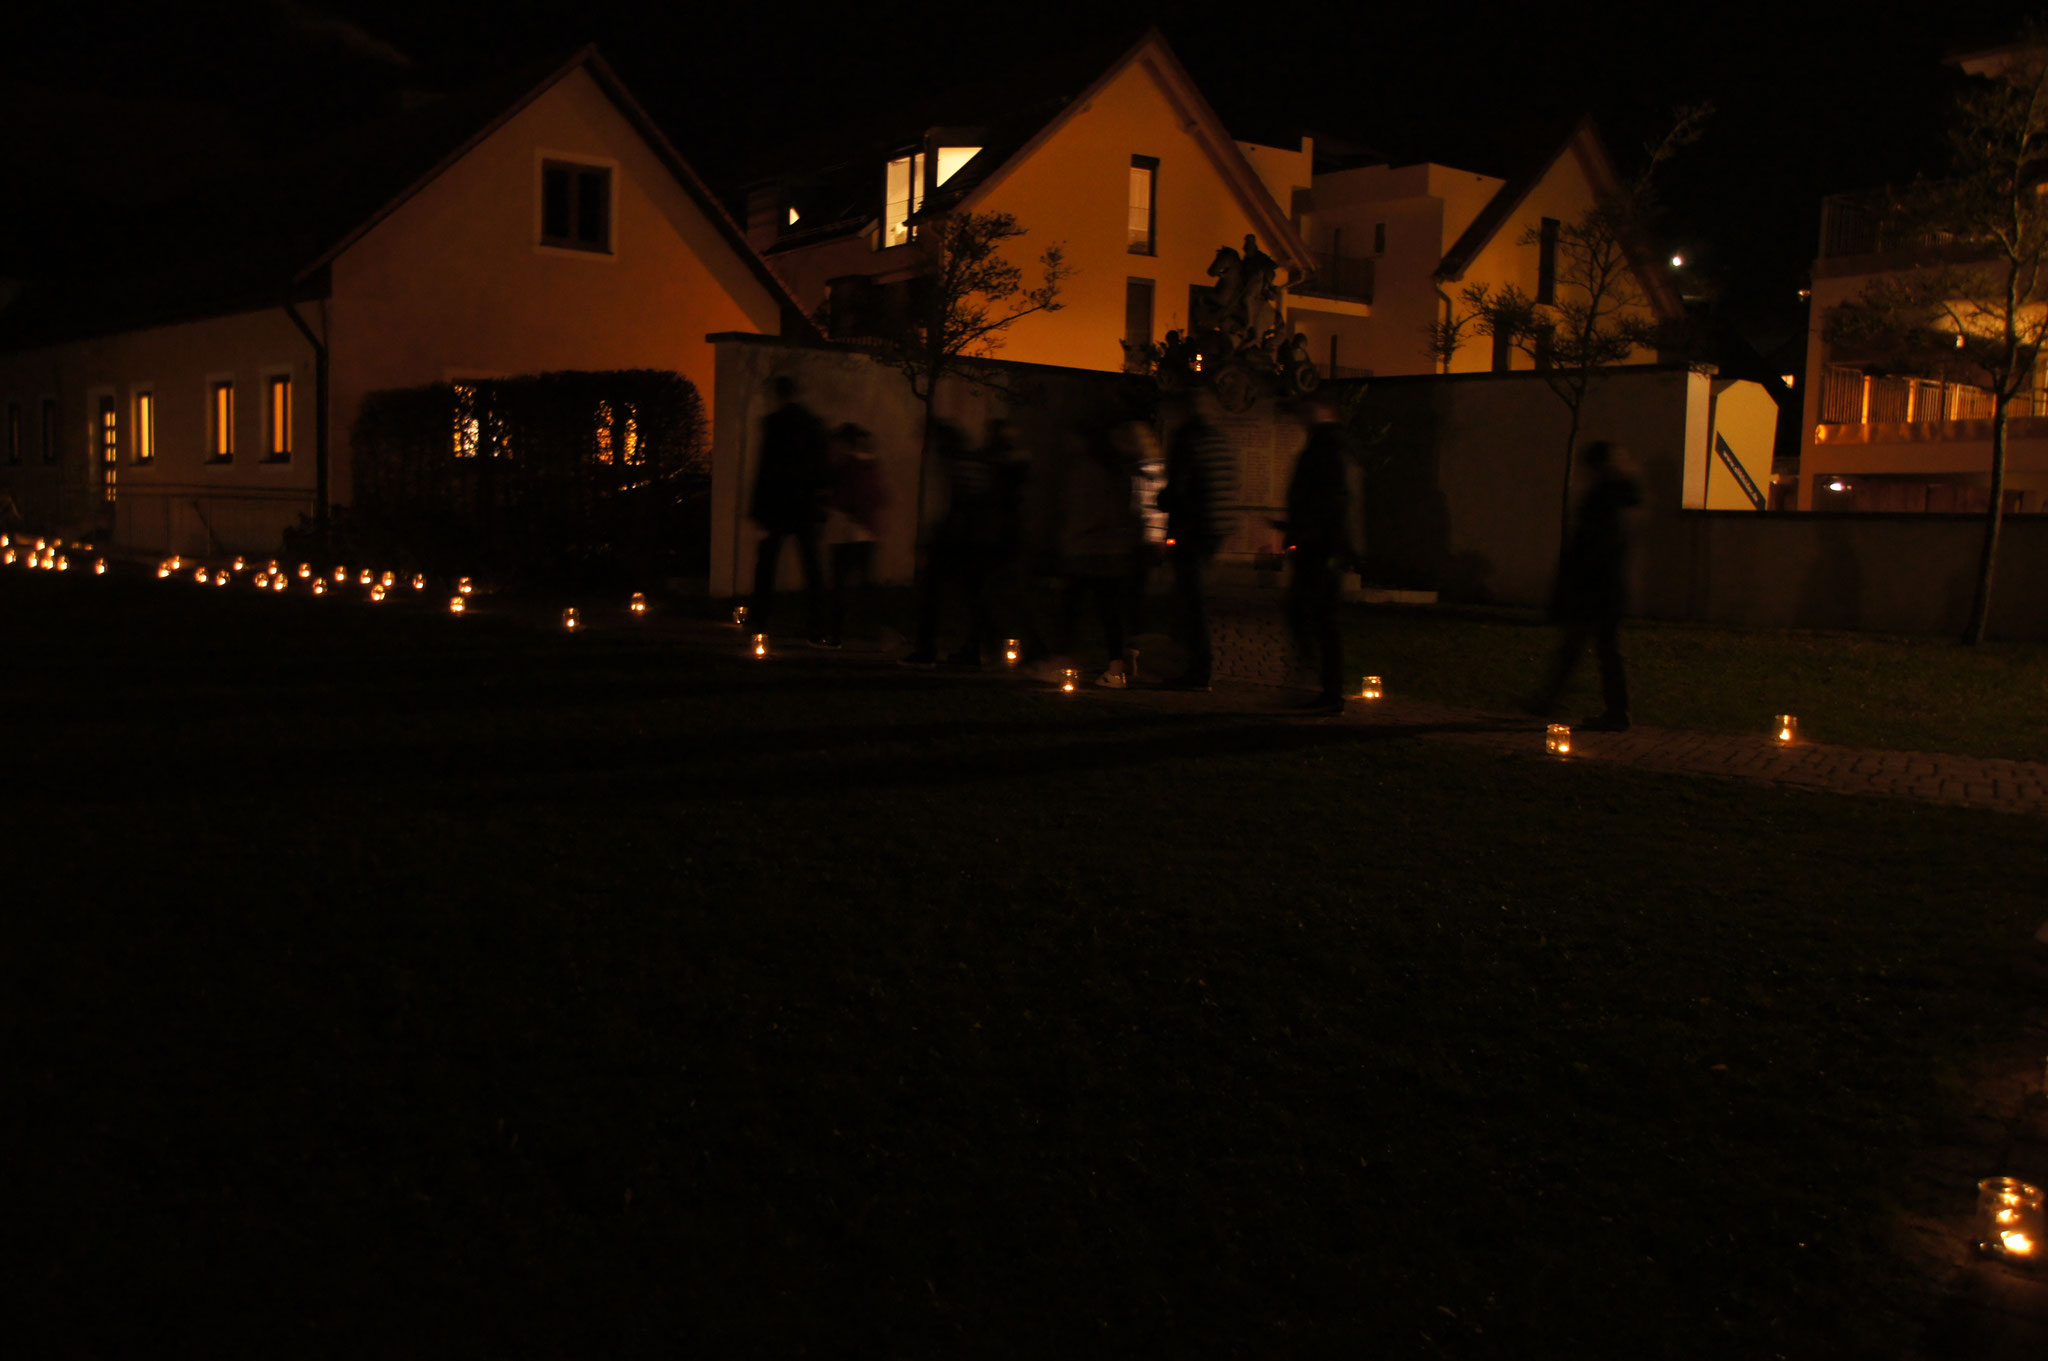 Lichter geleiten uns ins Pfarrheim... zu leckeren Knabbereien und GEMEINSCHAFT! :D